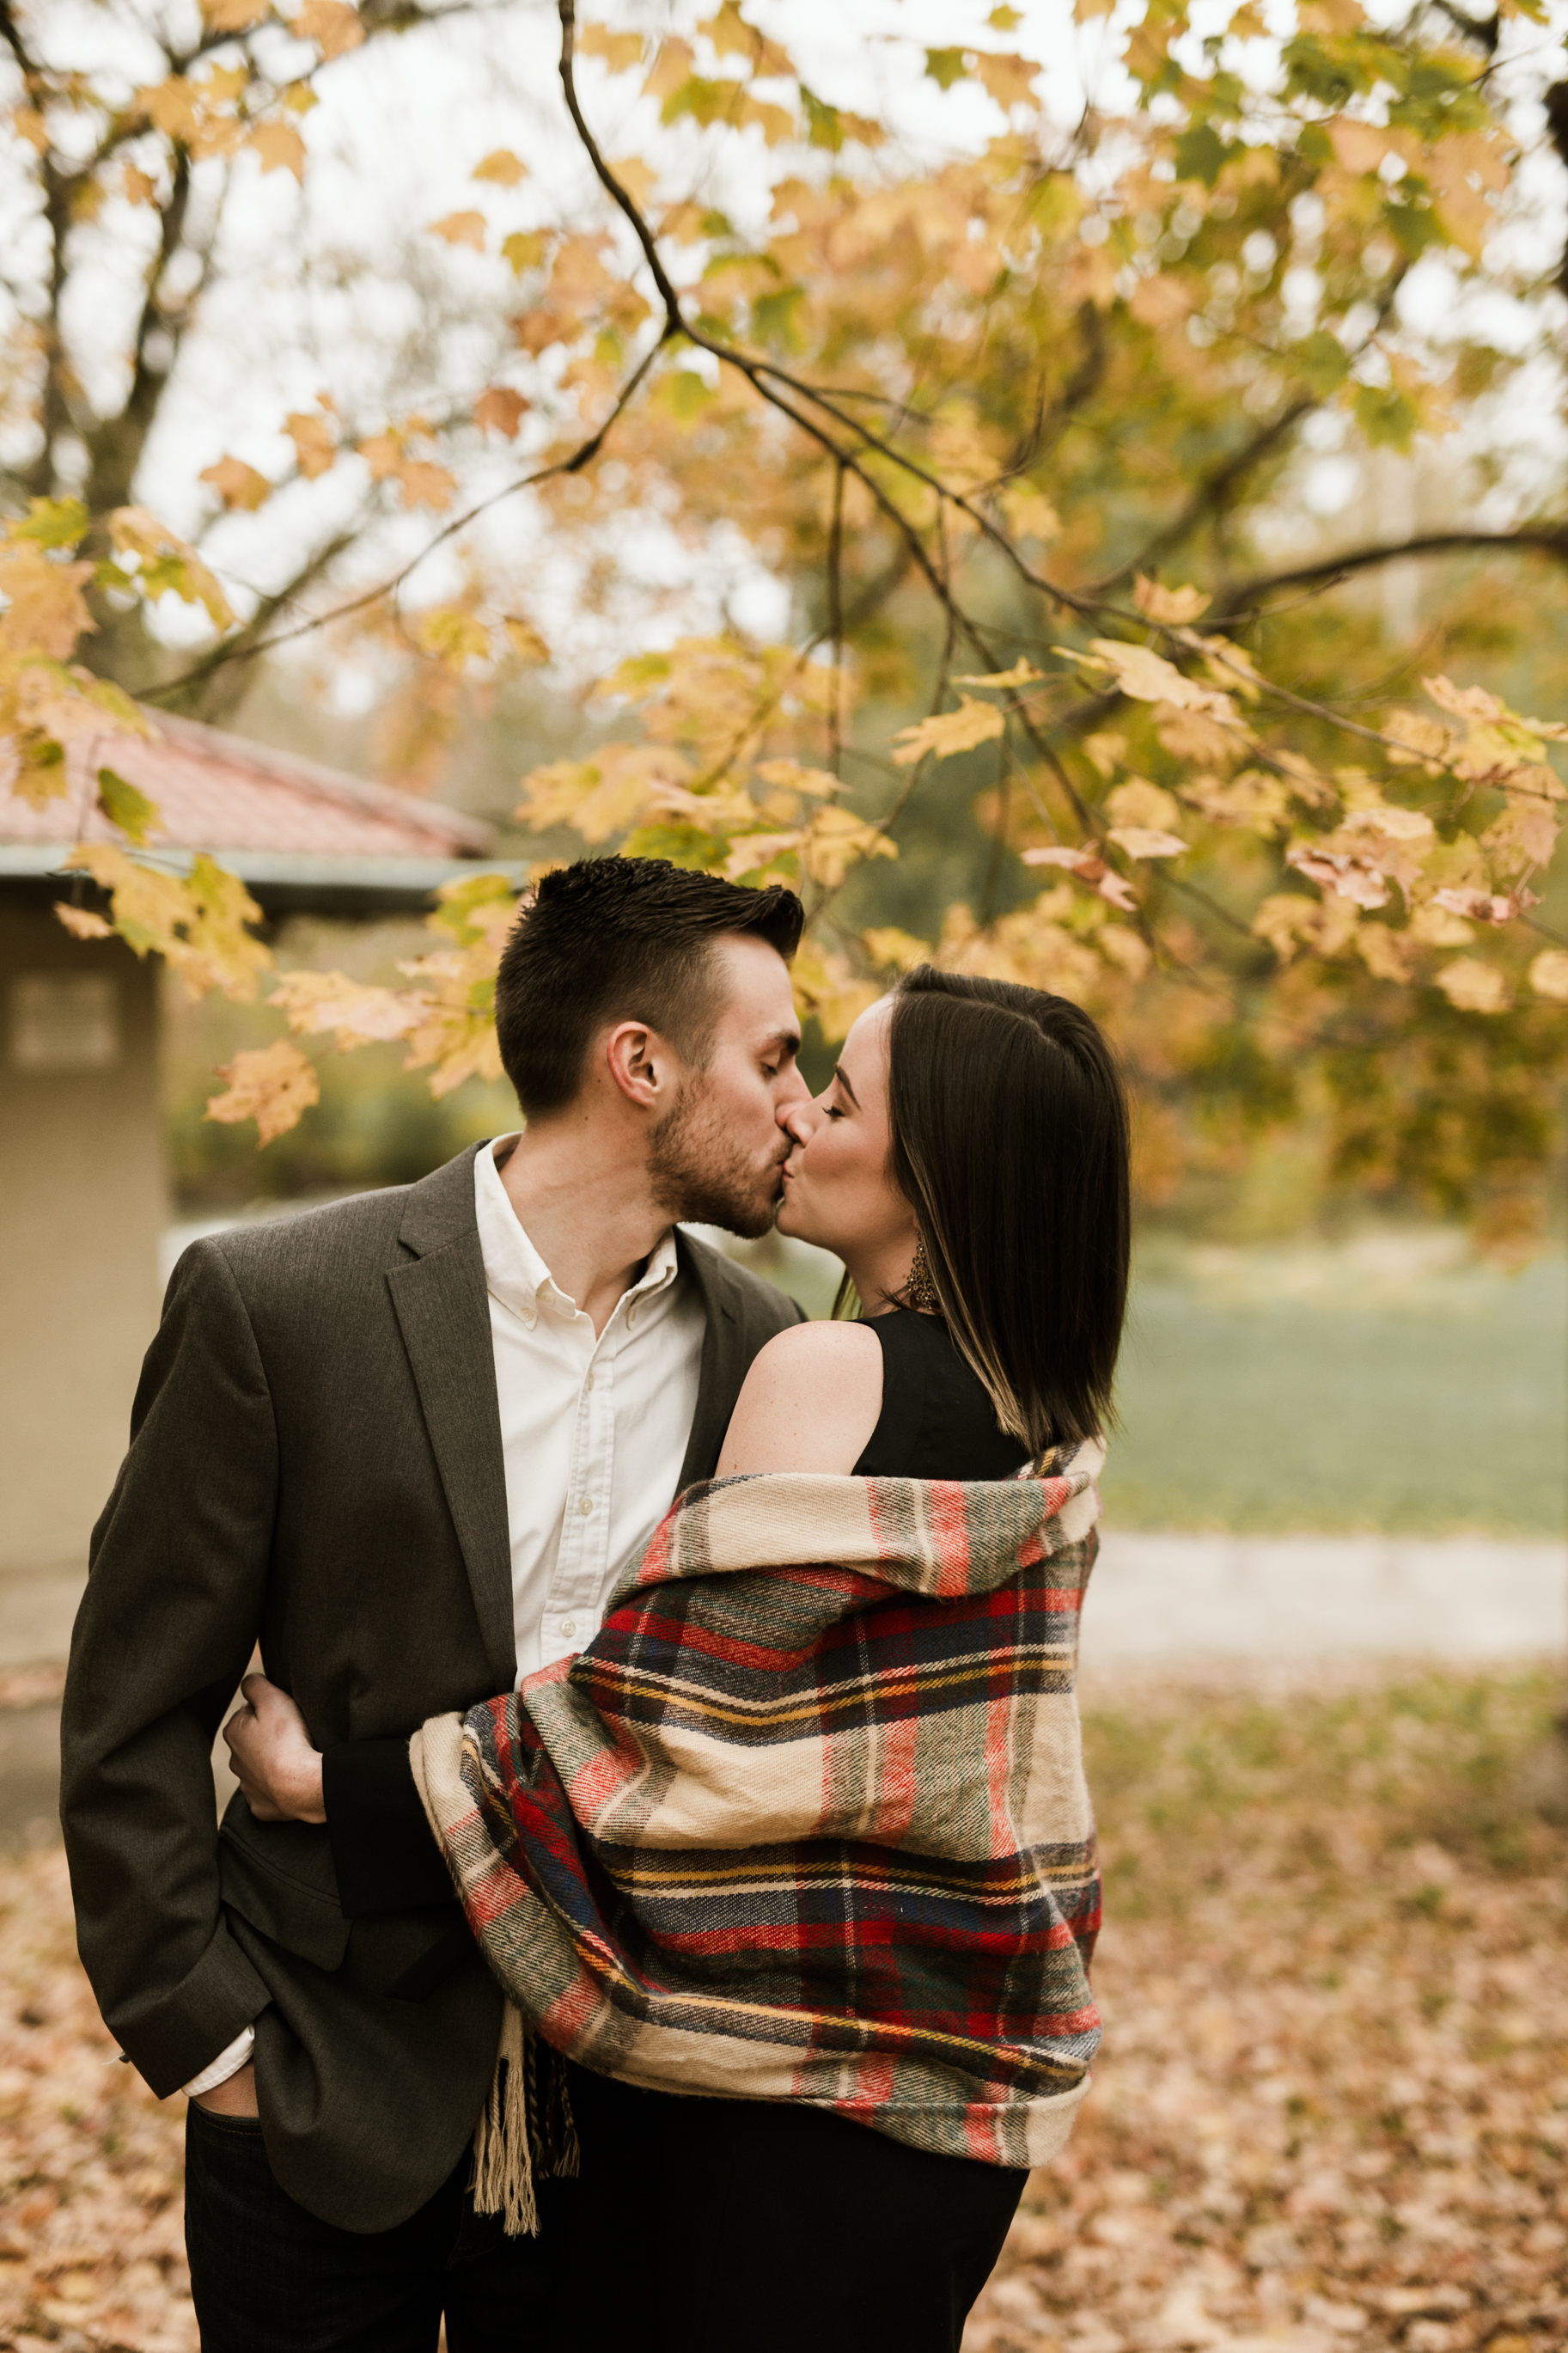 Kelsey and Daniel Engagement 2018 Crystal Ludwick Photo Louisville Wedding Photographer Kentucky Wedding Photographer (14 of 31).jpg